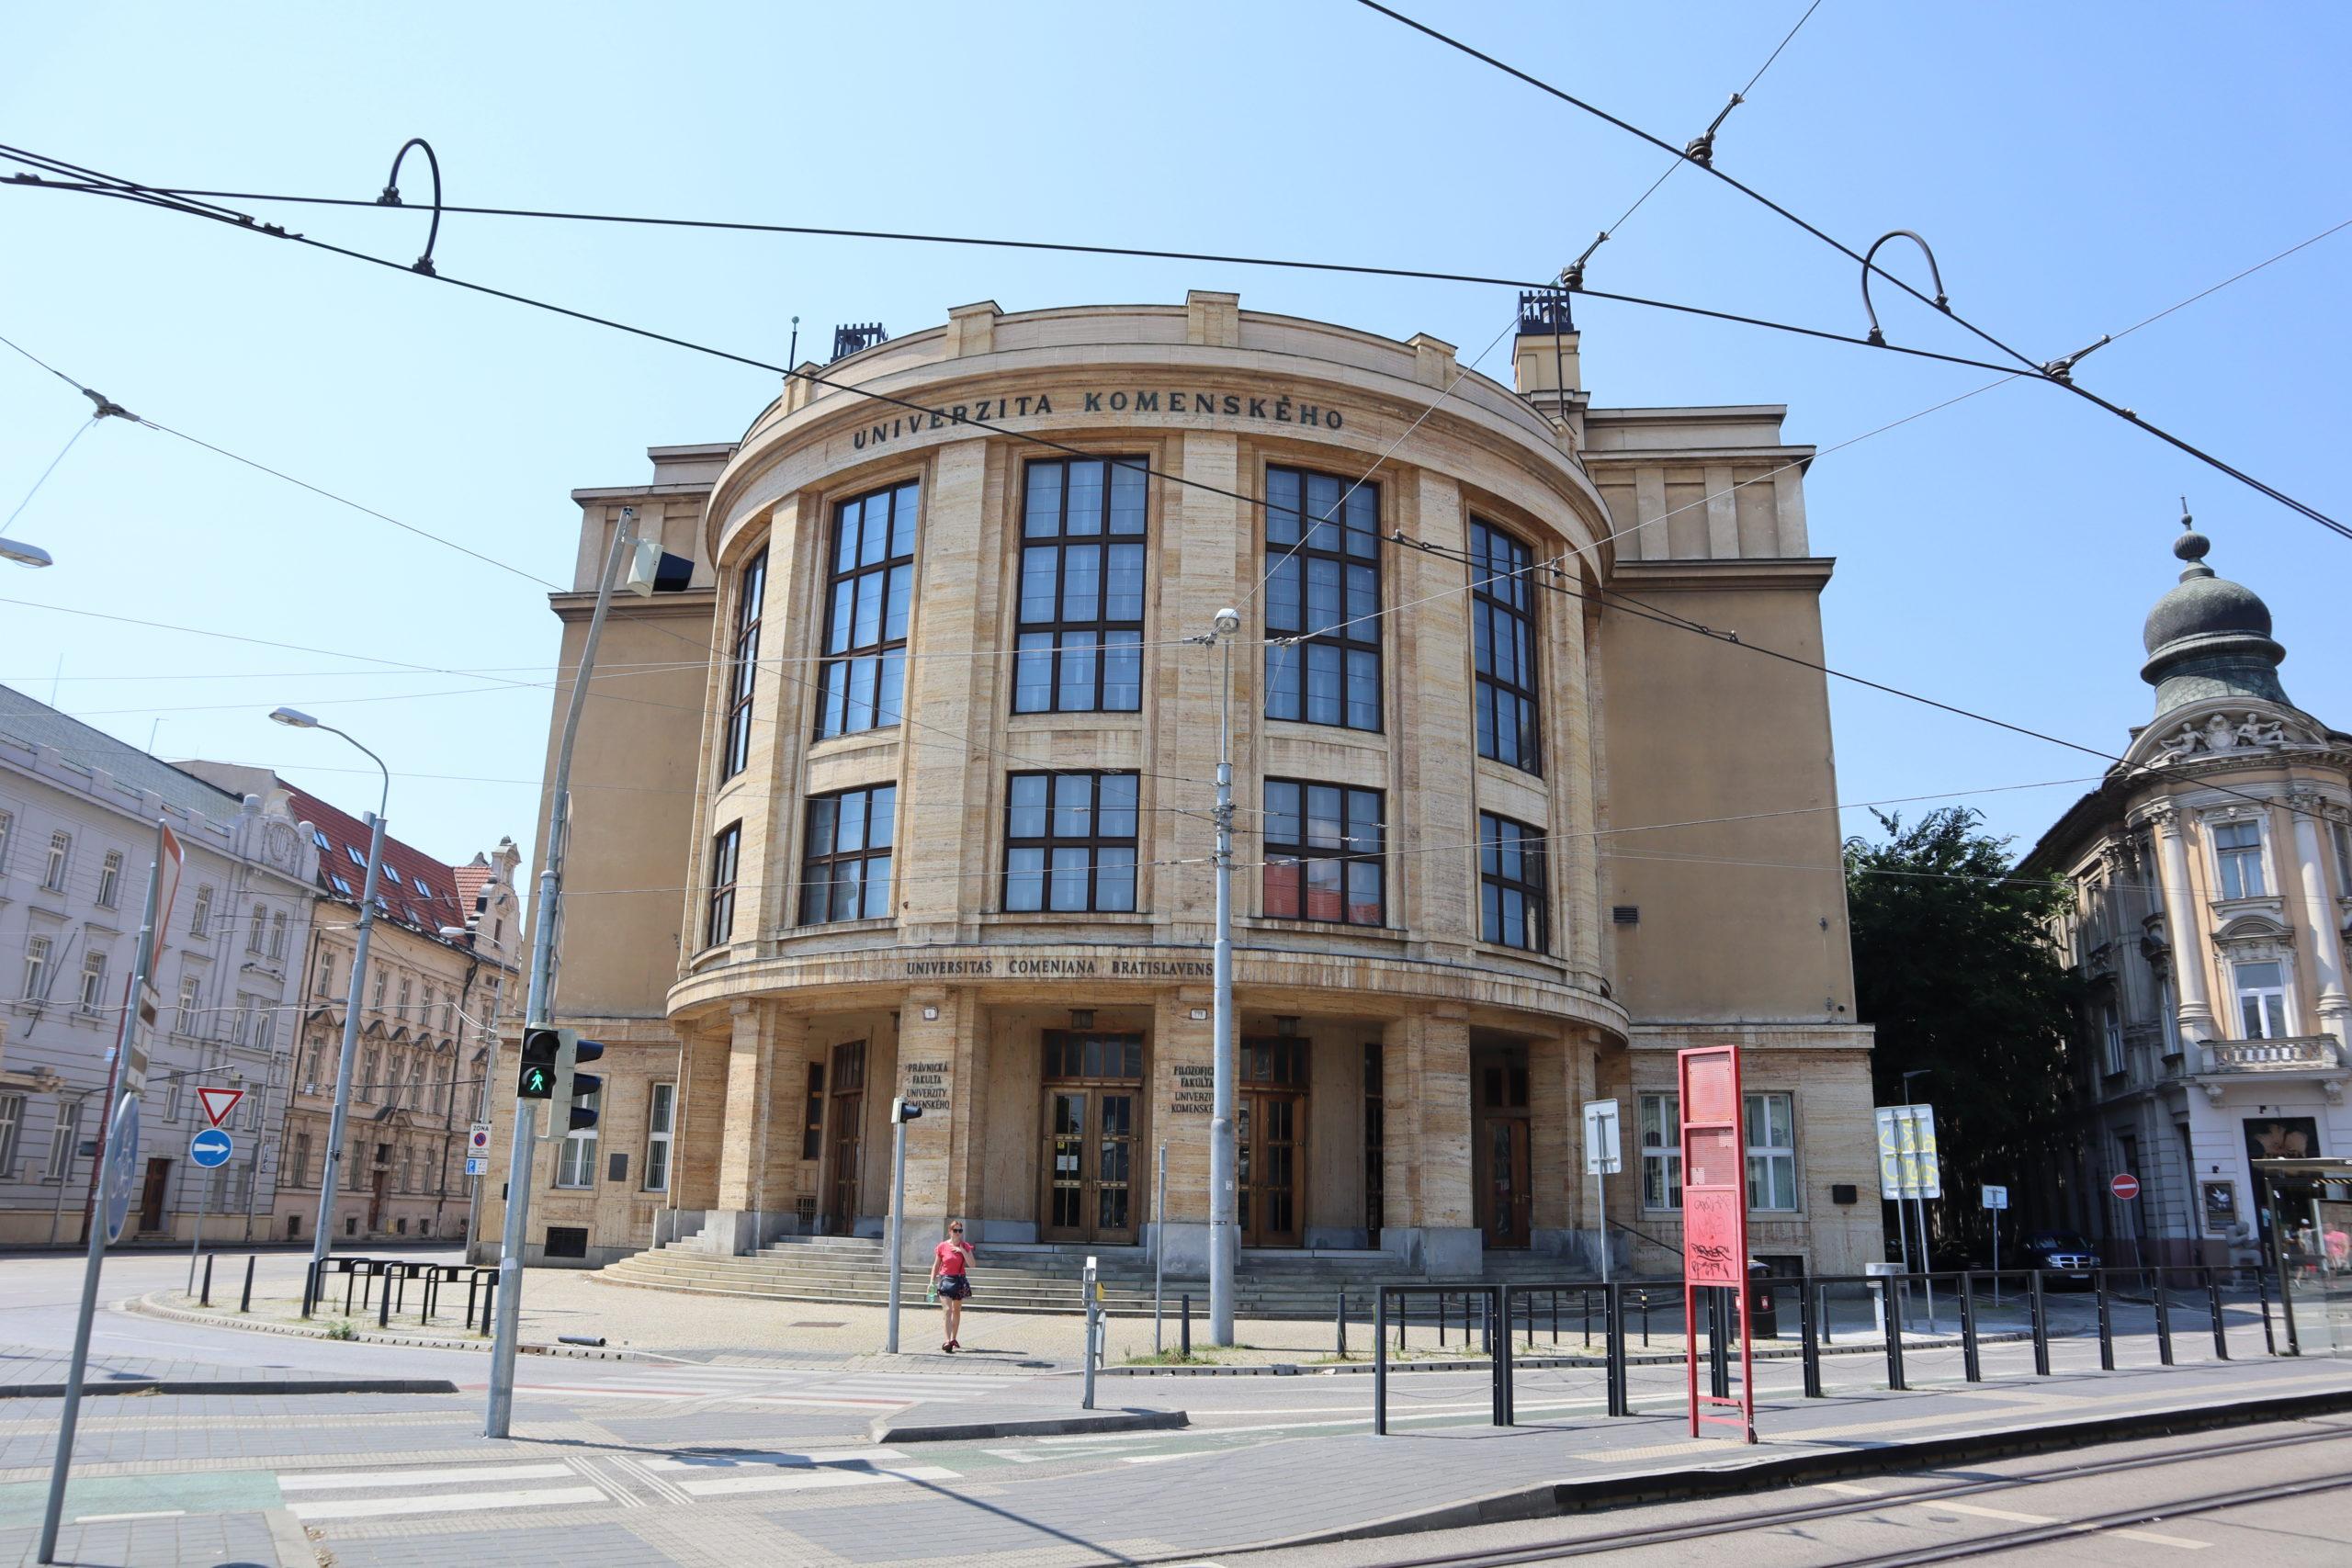 Safarik-universidad-Comenius-Bratislaba